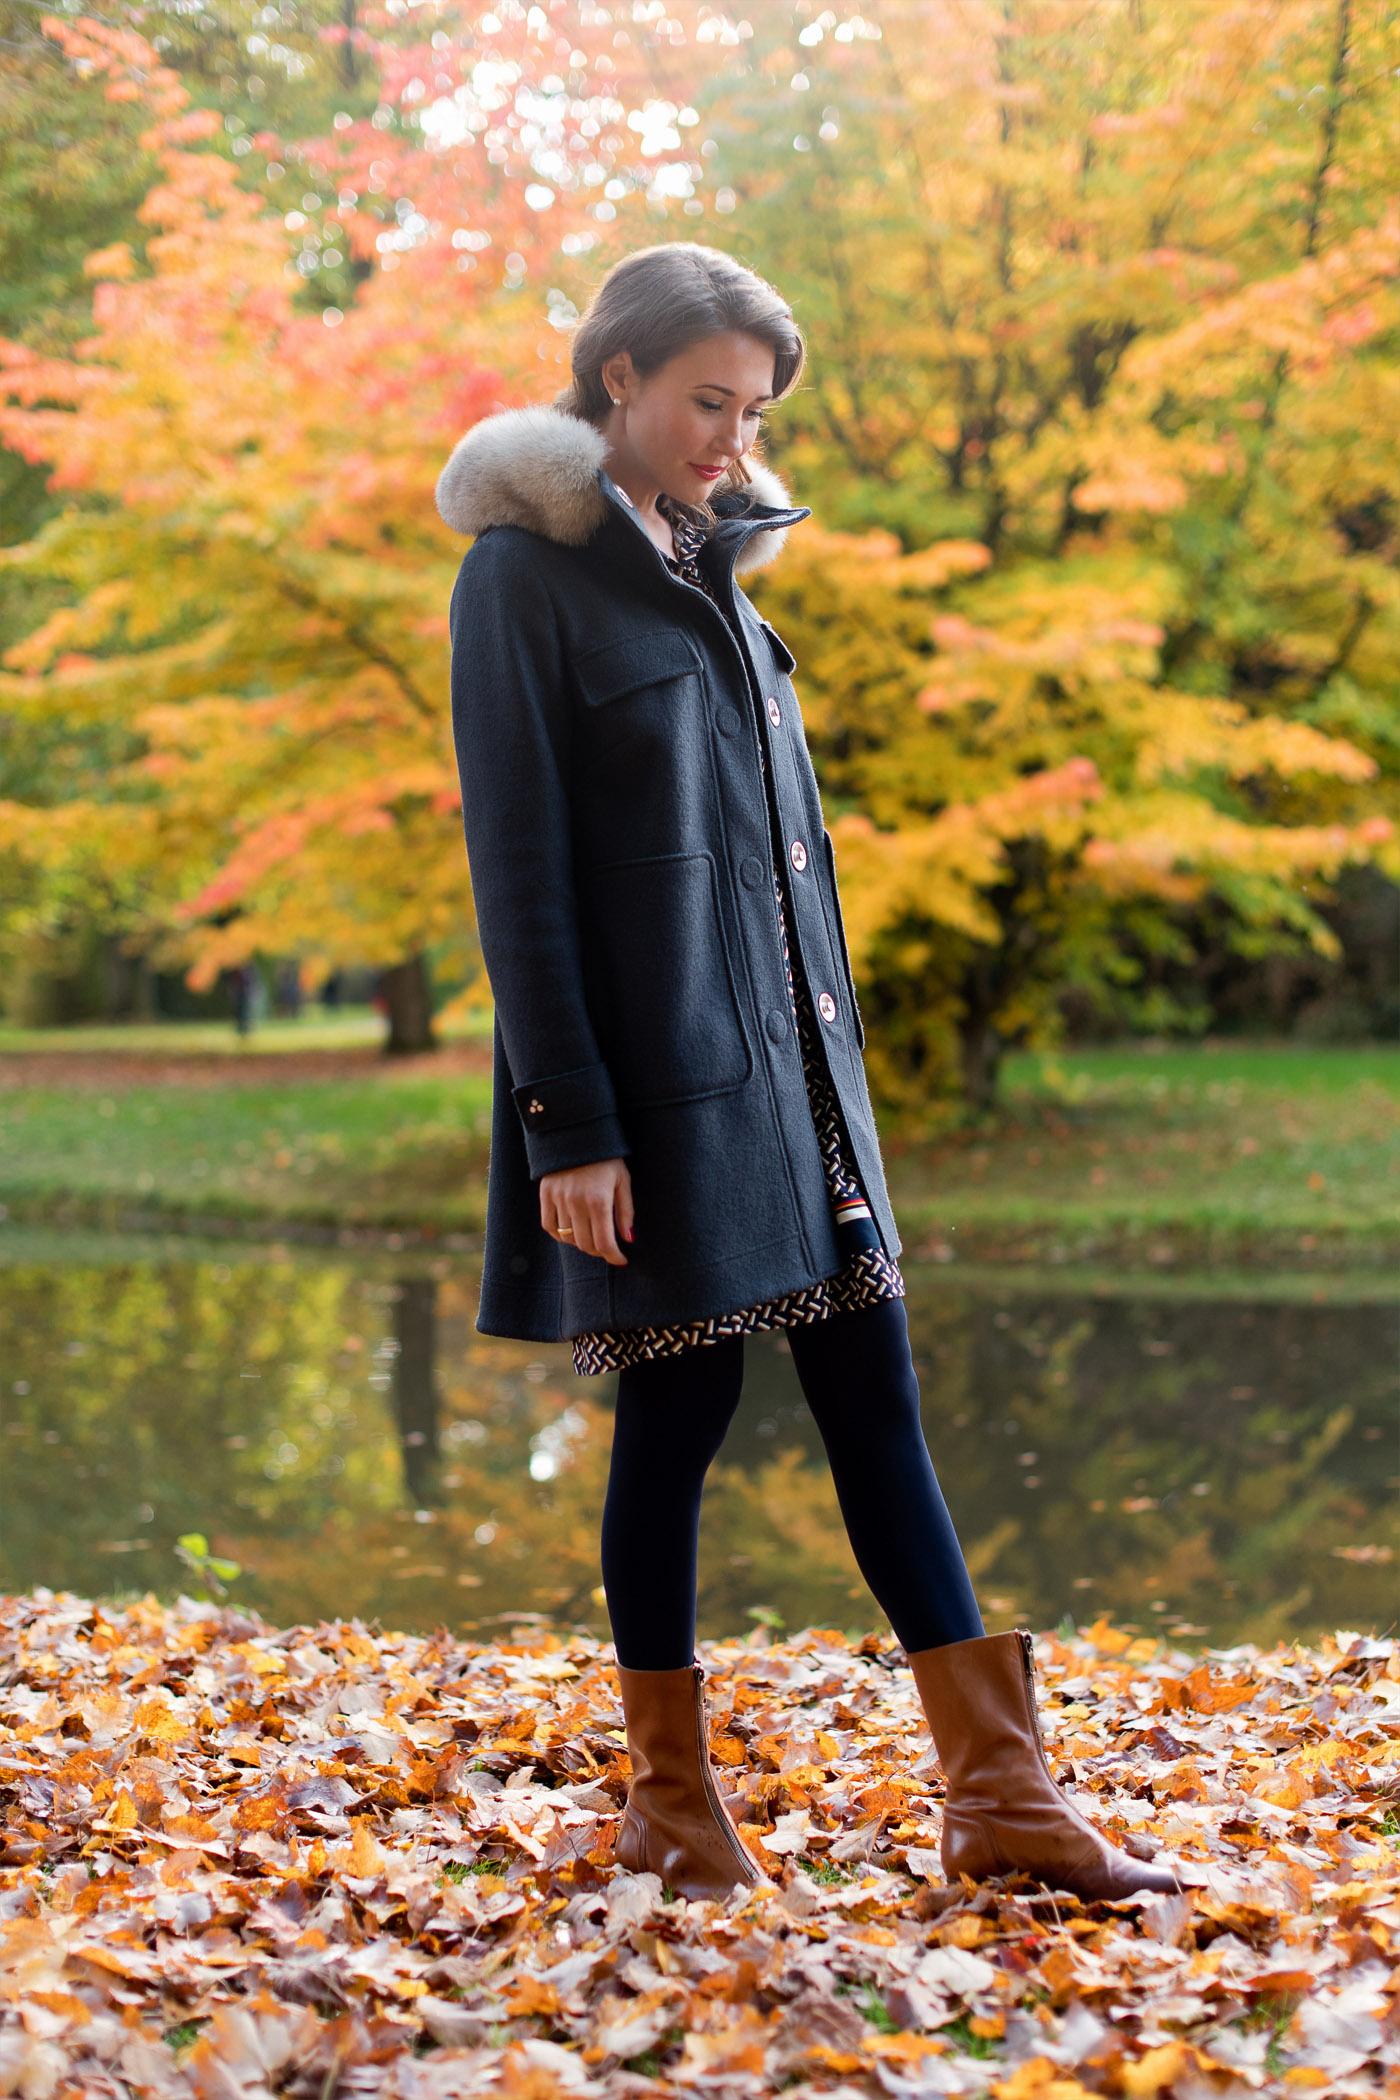 tommy-hilfiger-kleid-dress-zara-bag-booties-fall-fashion-peuterey-coat-mantel-fashionblog